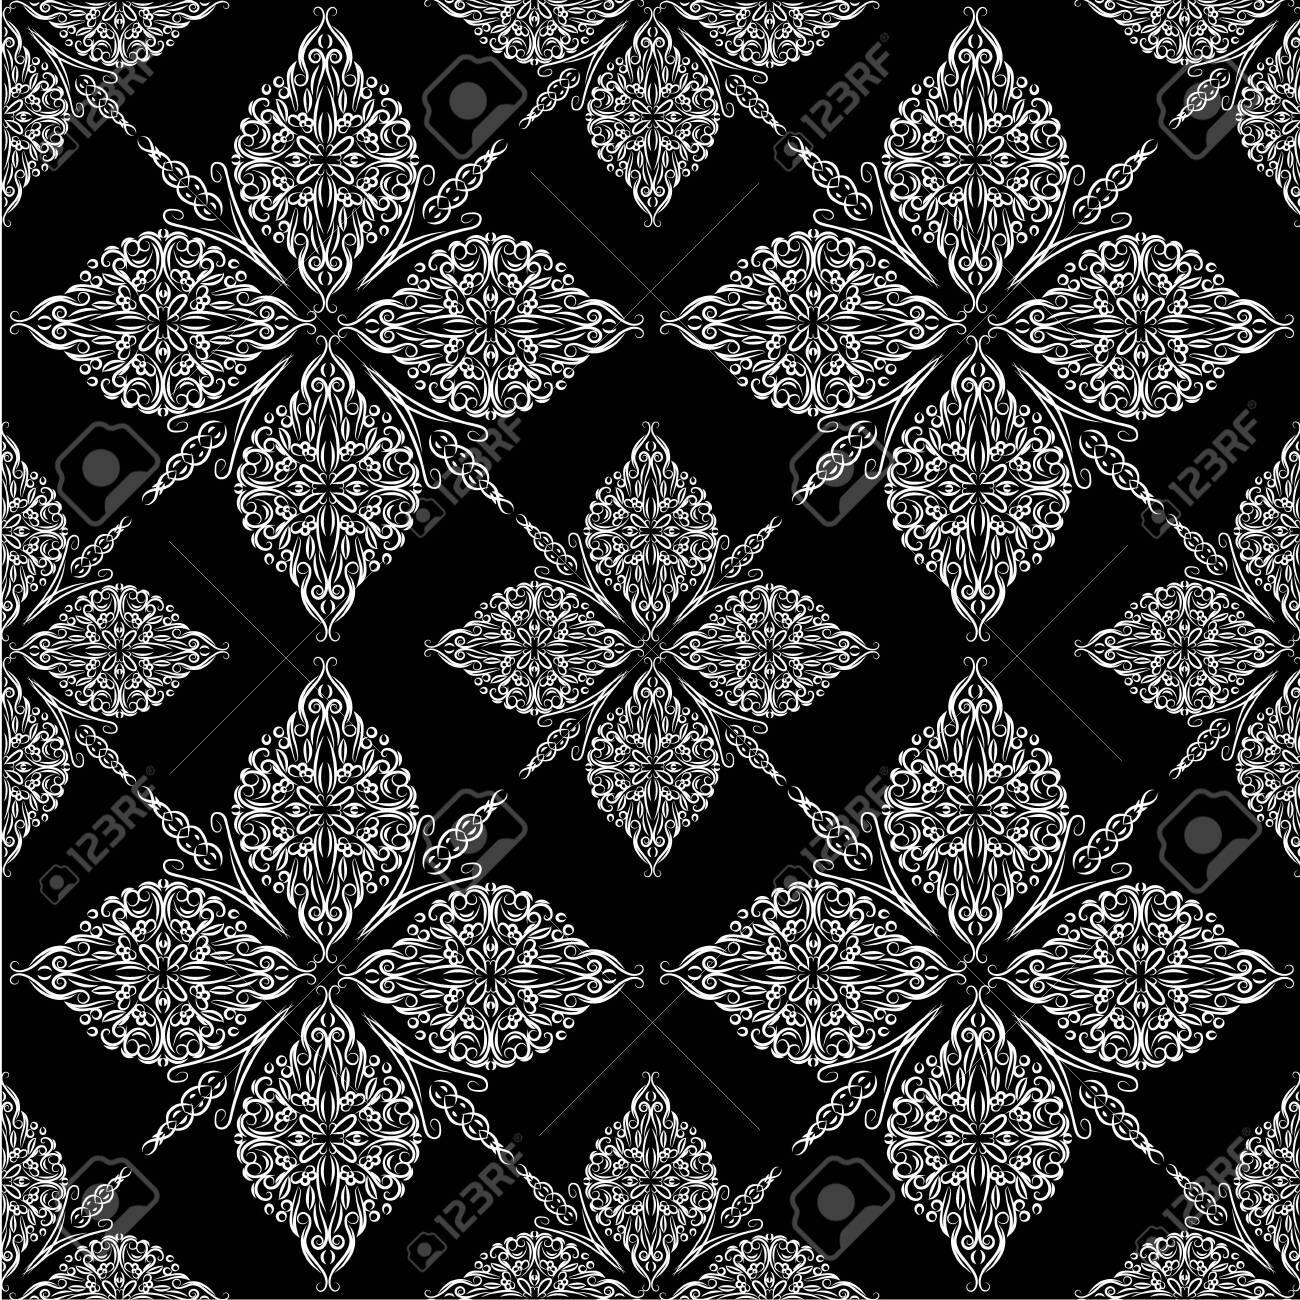 Ornate vintage seamless damask background. Floral baroque ornament in Victorian style. Pattern design, decorative retro decor, vector illustration - 134480829